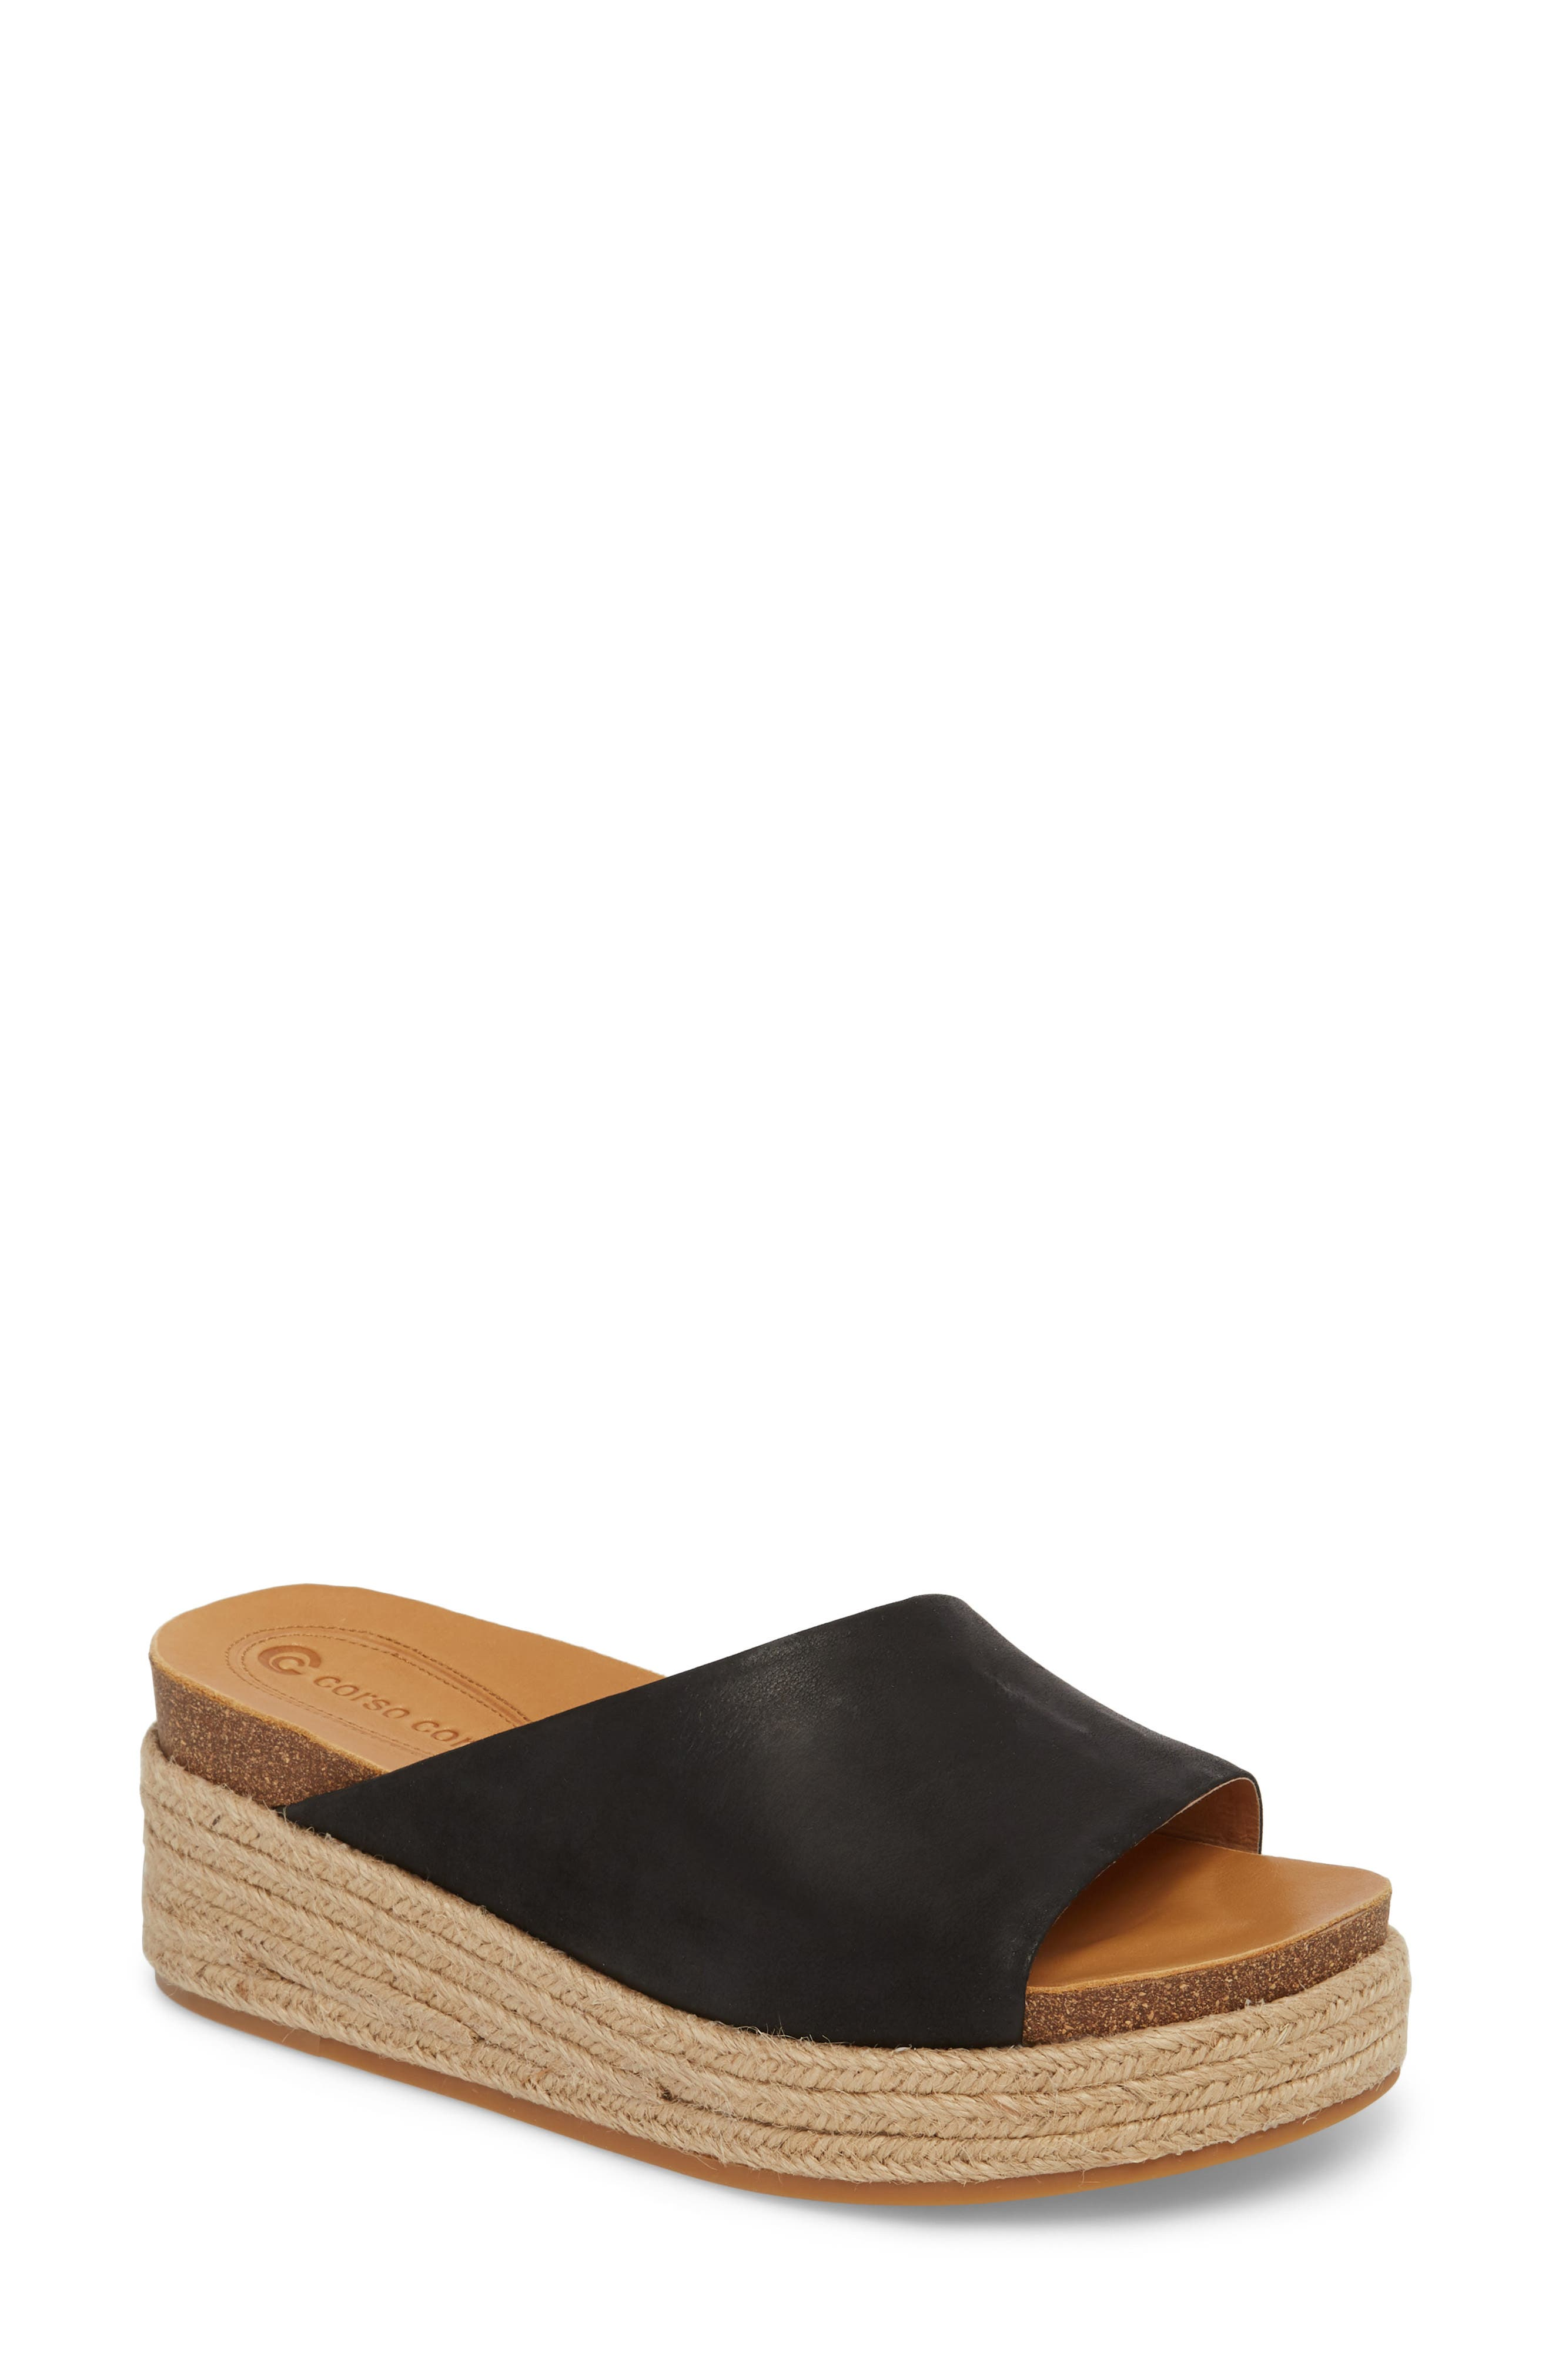 Candice Sandal,                         Main,                         color, Black Leather